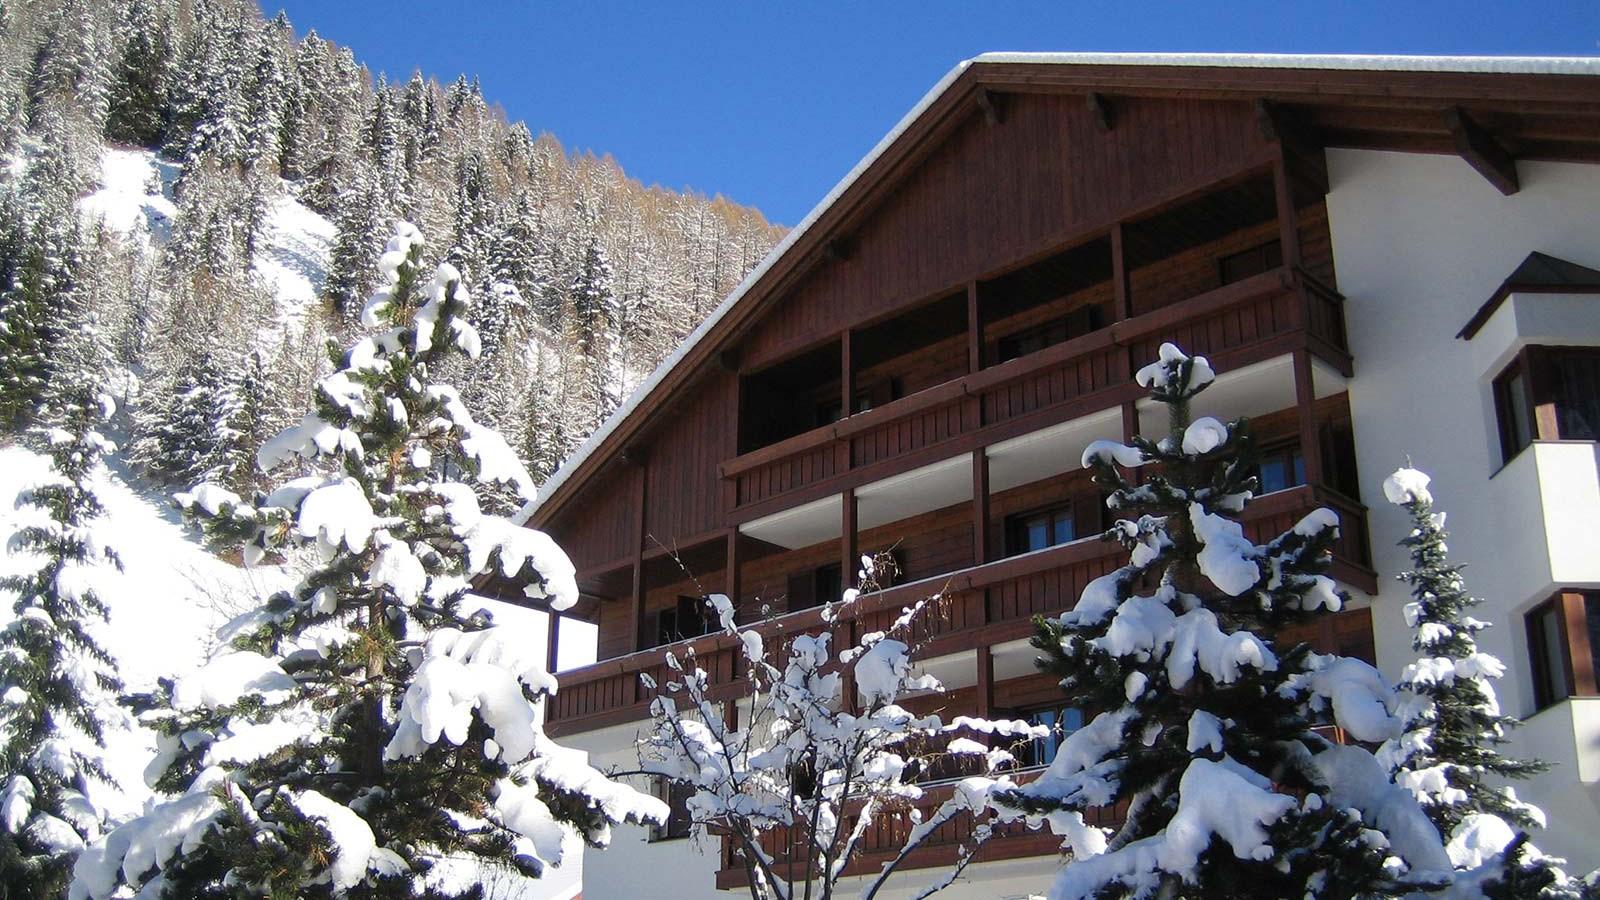 Hotel Alpin Haus, Selva Val Gardena - External View